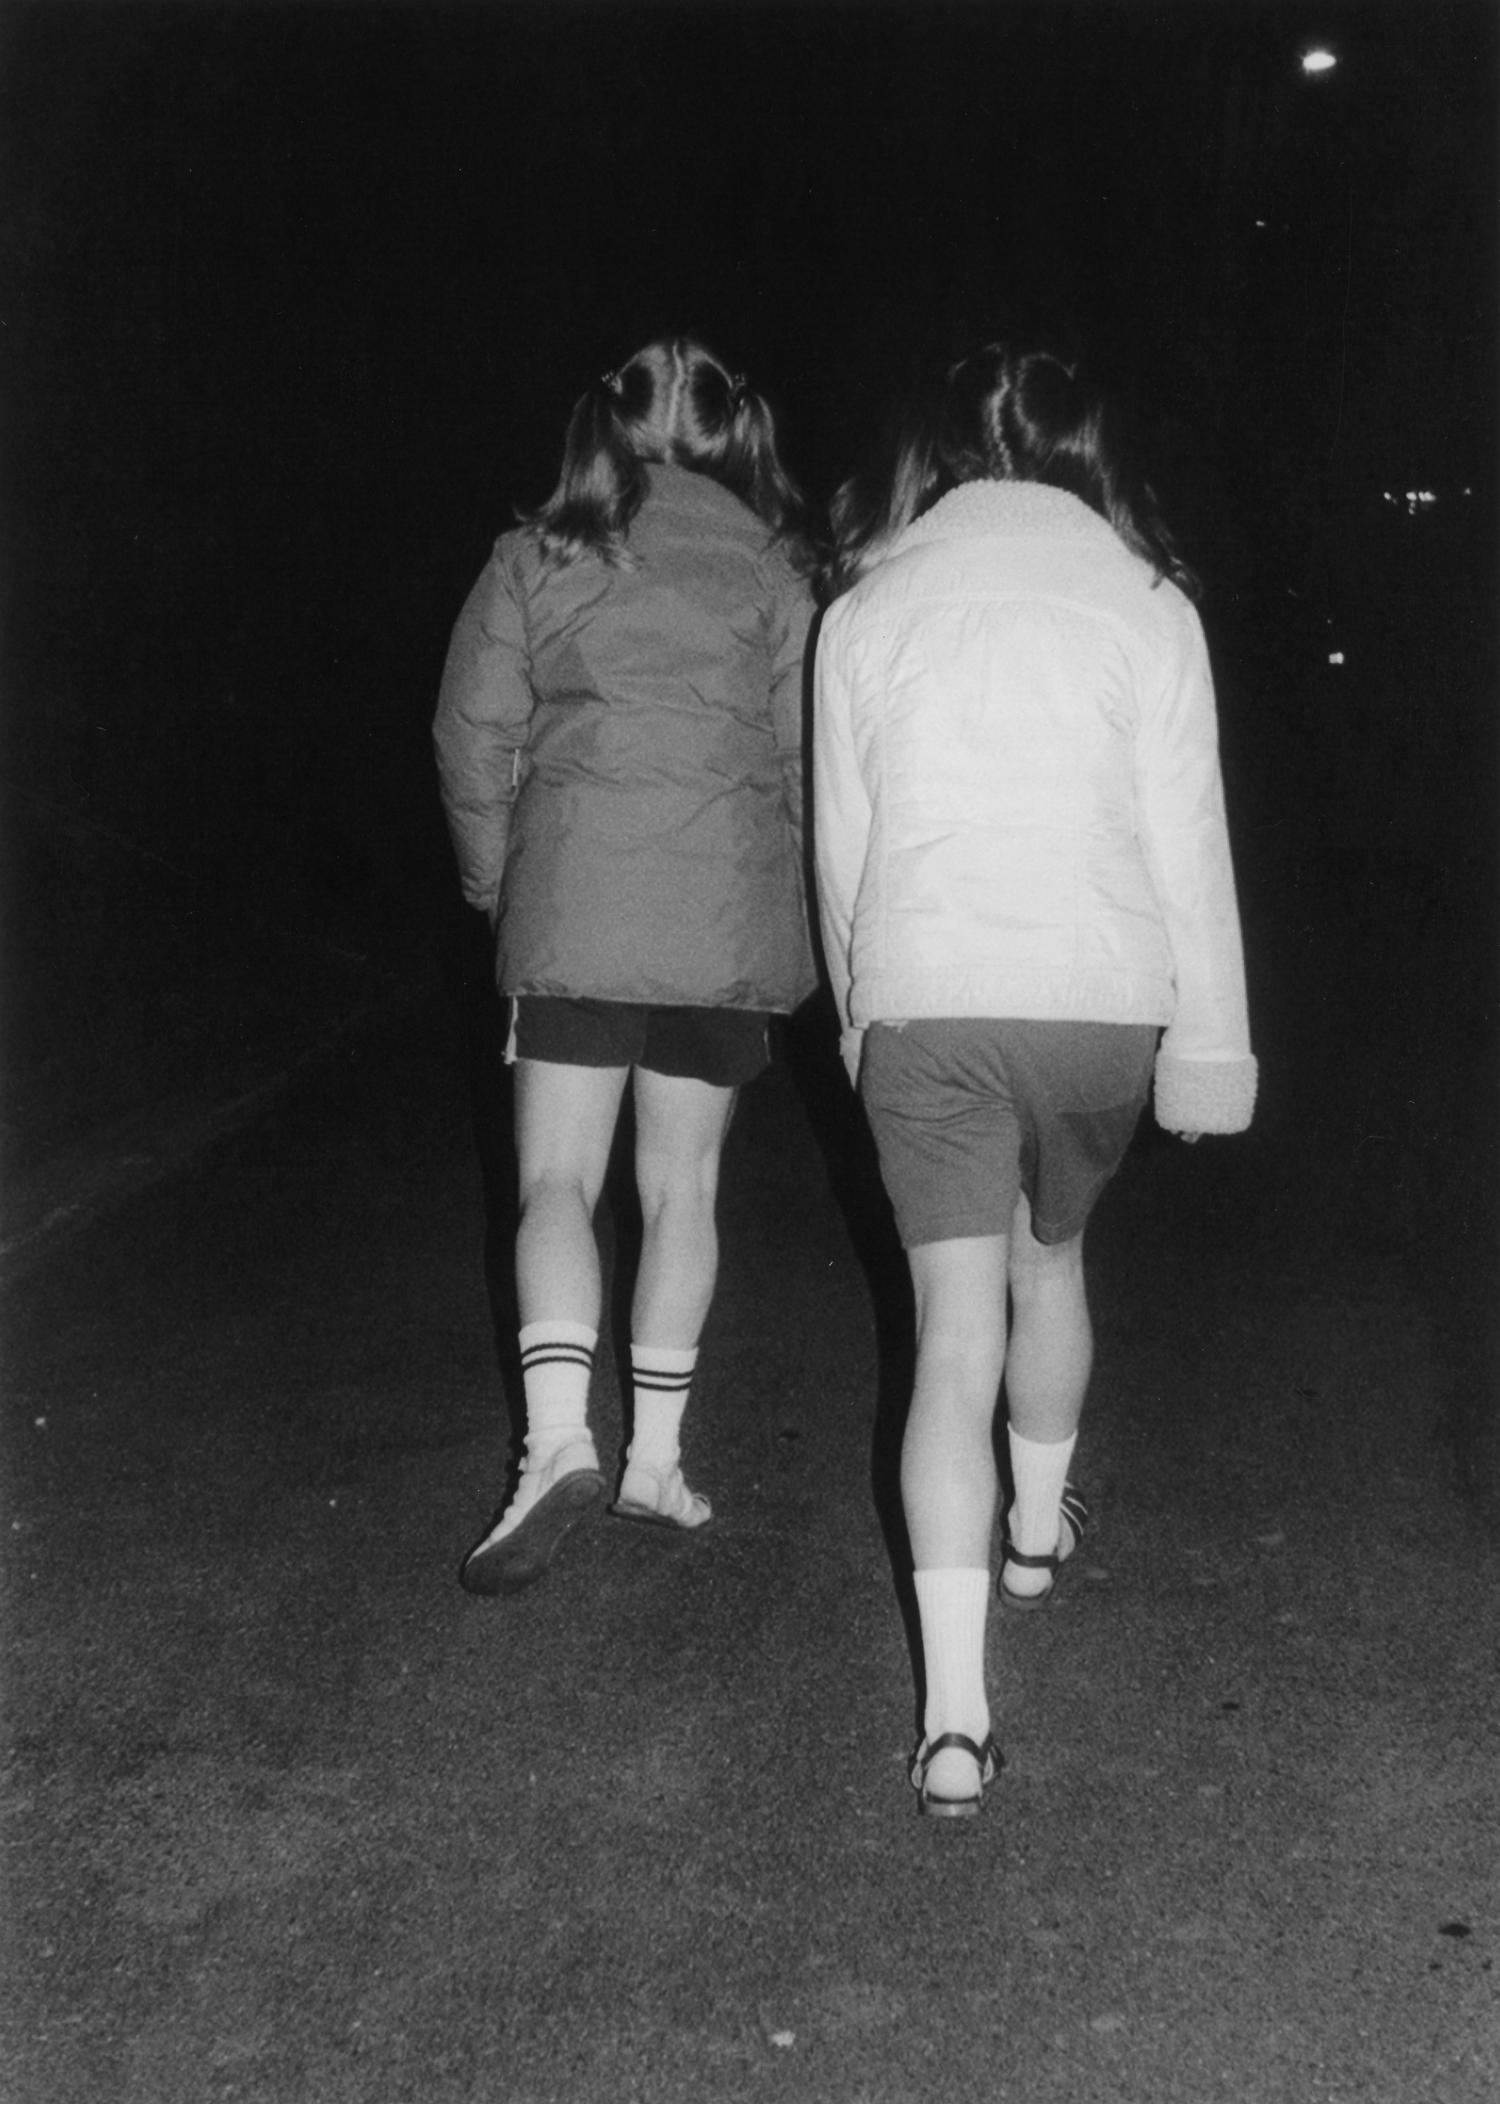 Good Sister/Bad Sister, 1996